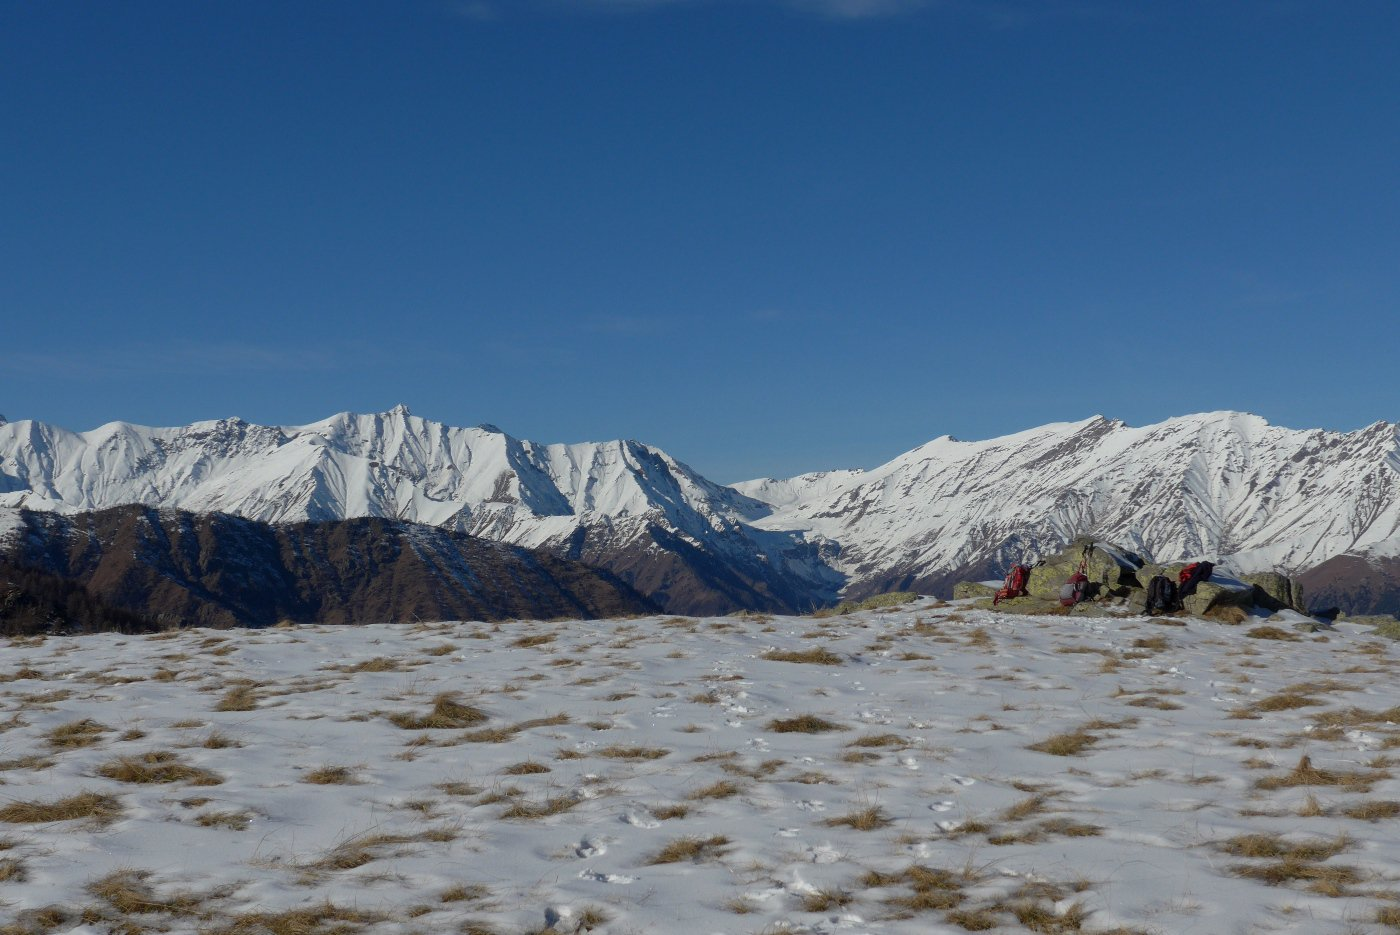 Montagne della val Germanasca